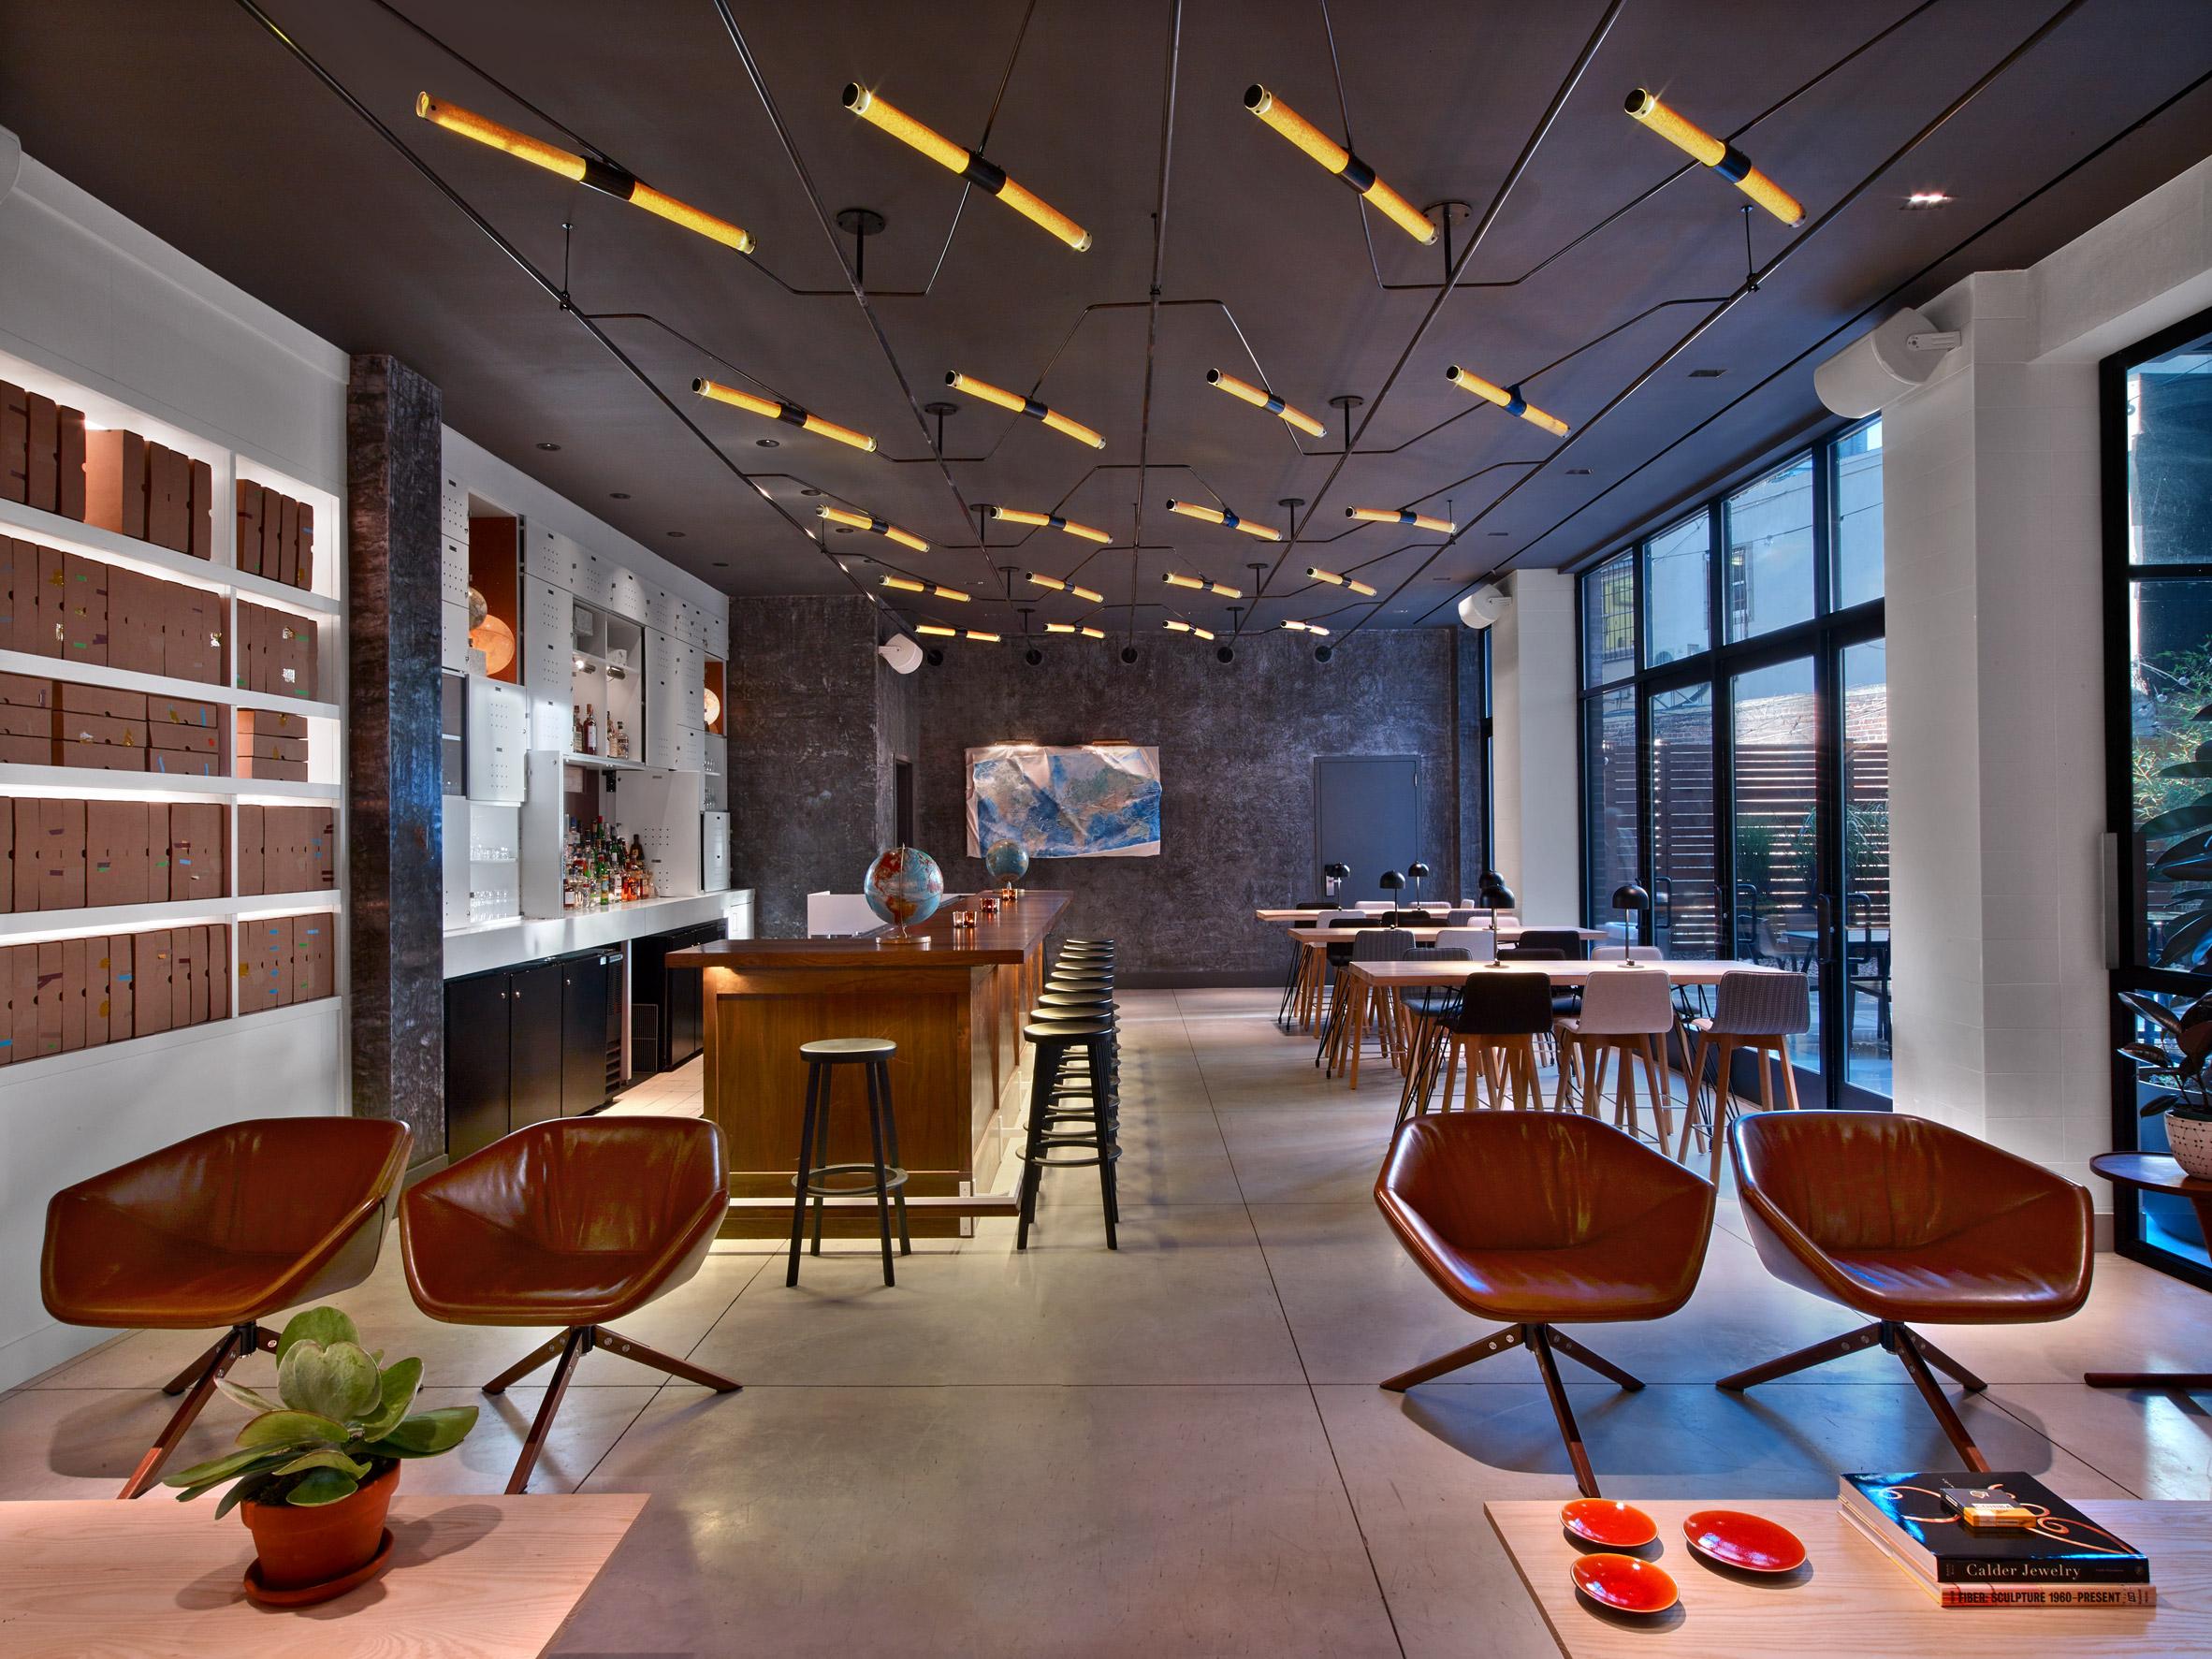 architecture-new-york-city-micro-hotel-design-studia-interiors-osnovadesign-osnova-poltava_10